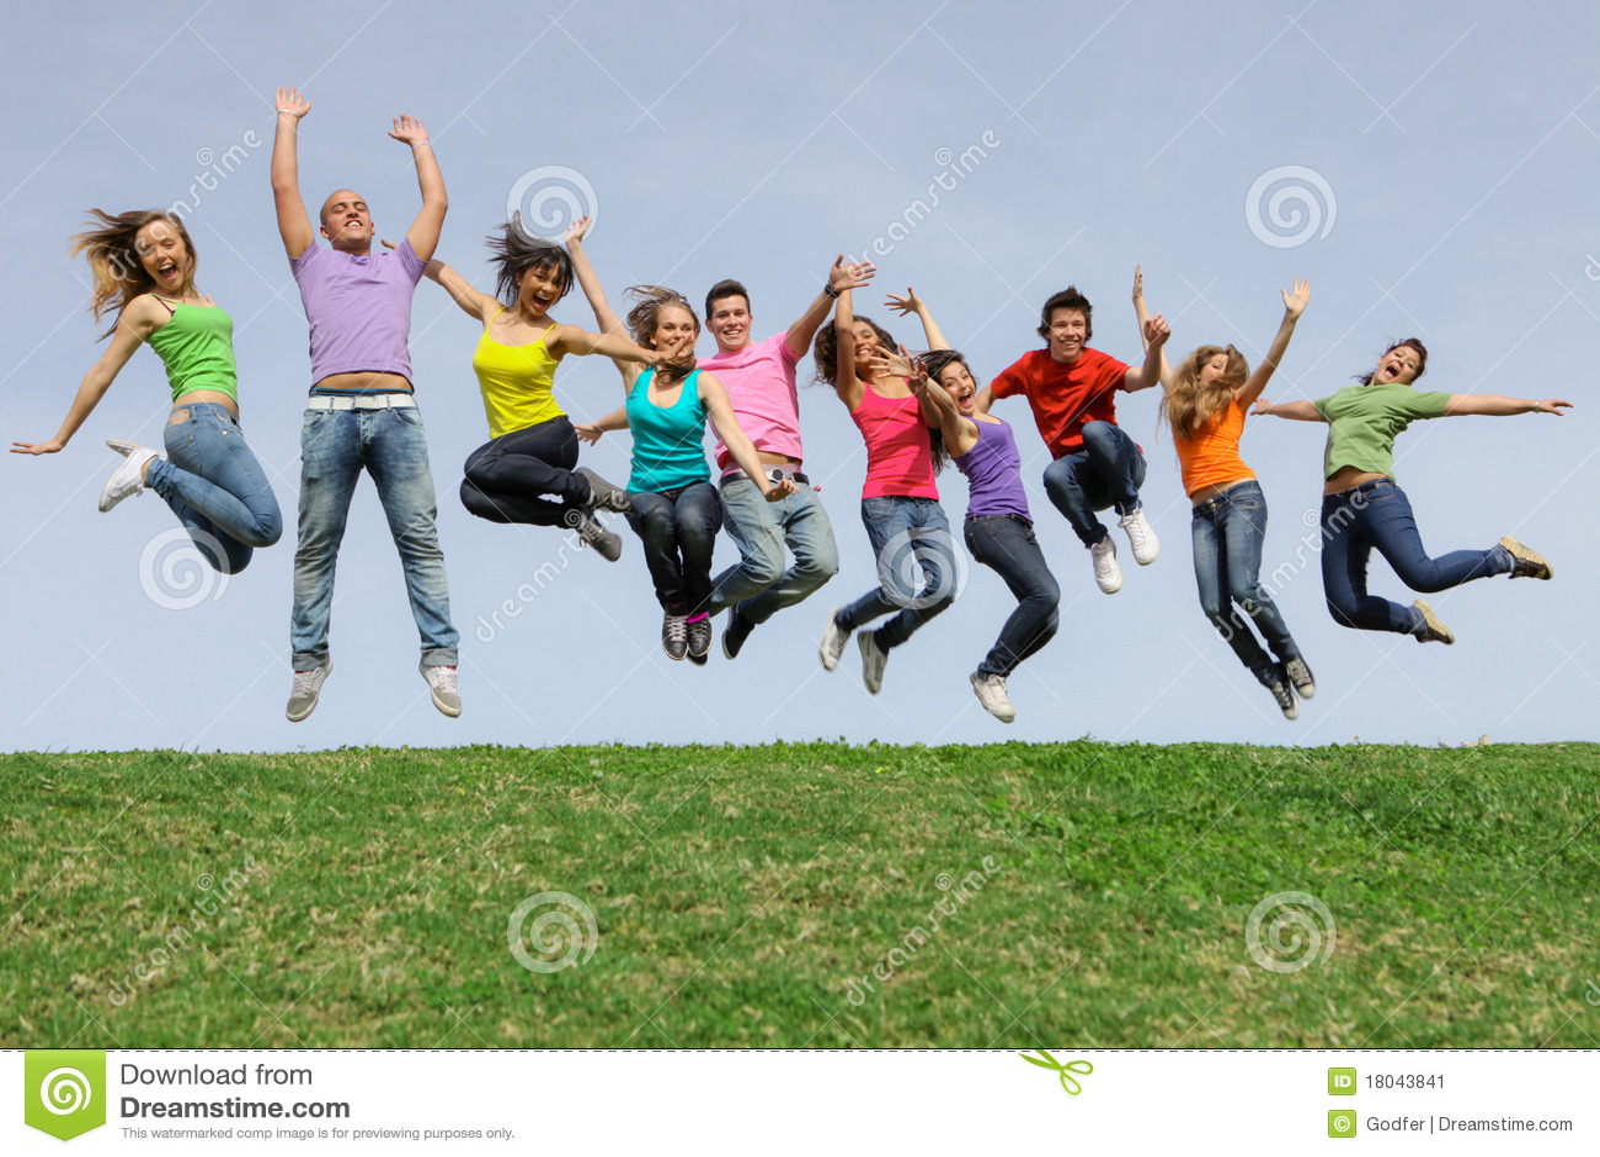 diverse Group teens, teenagers jumping